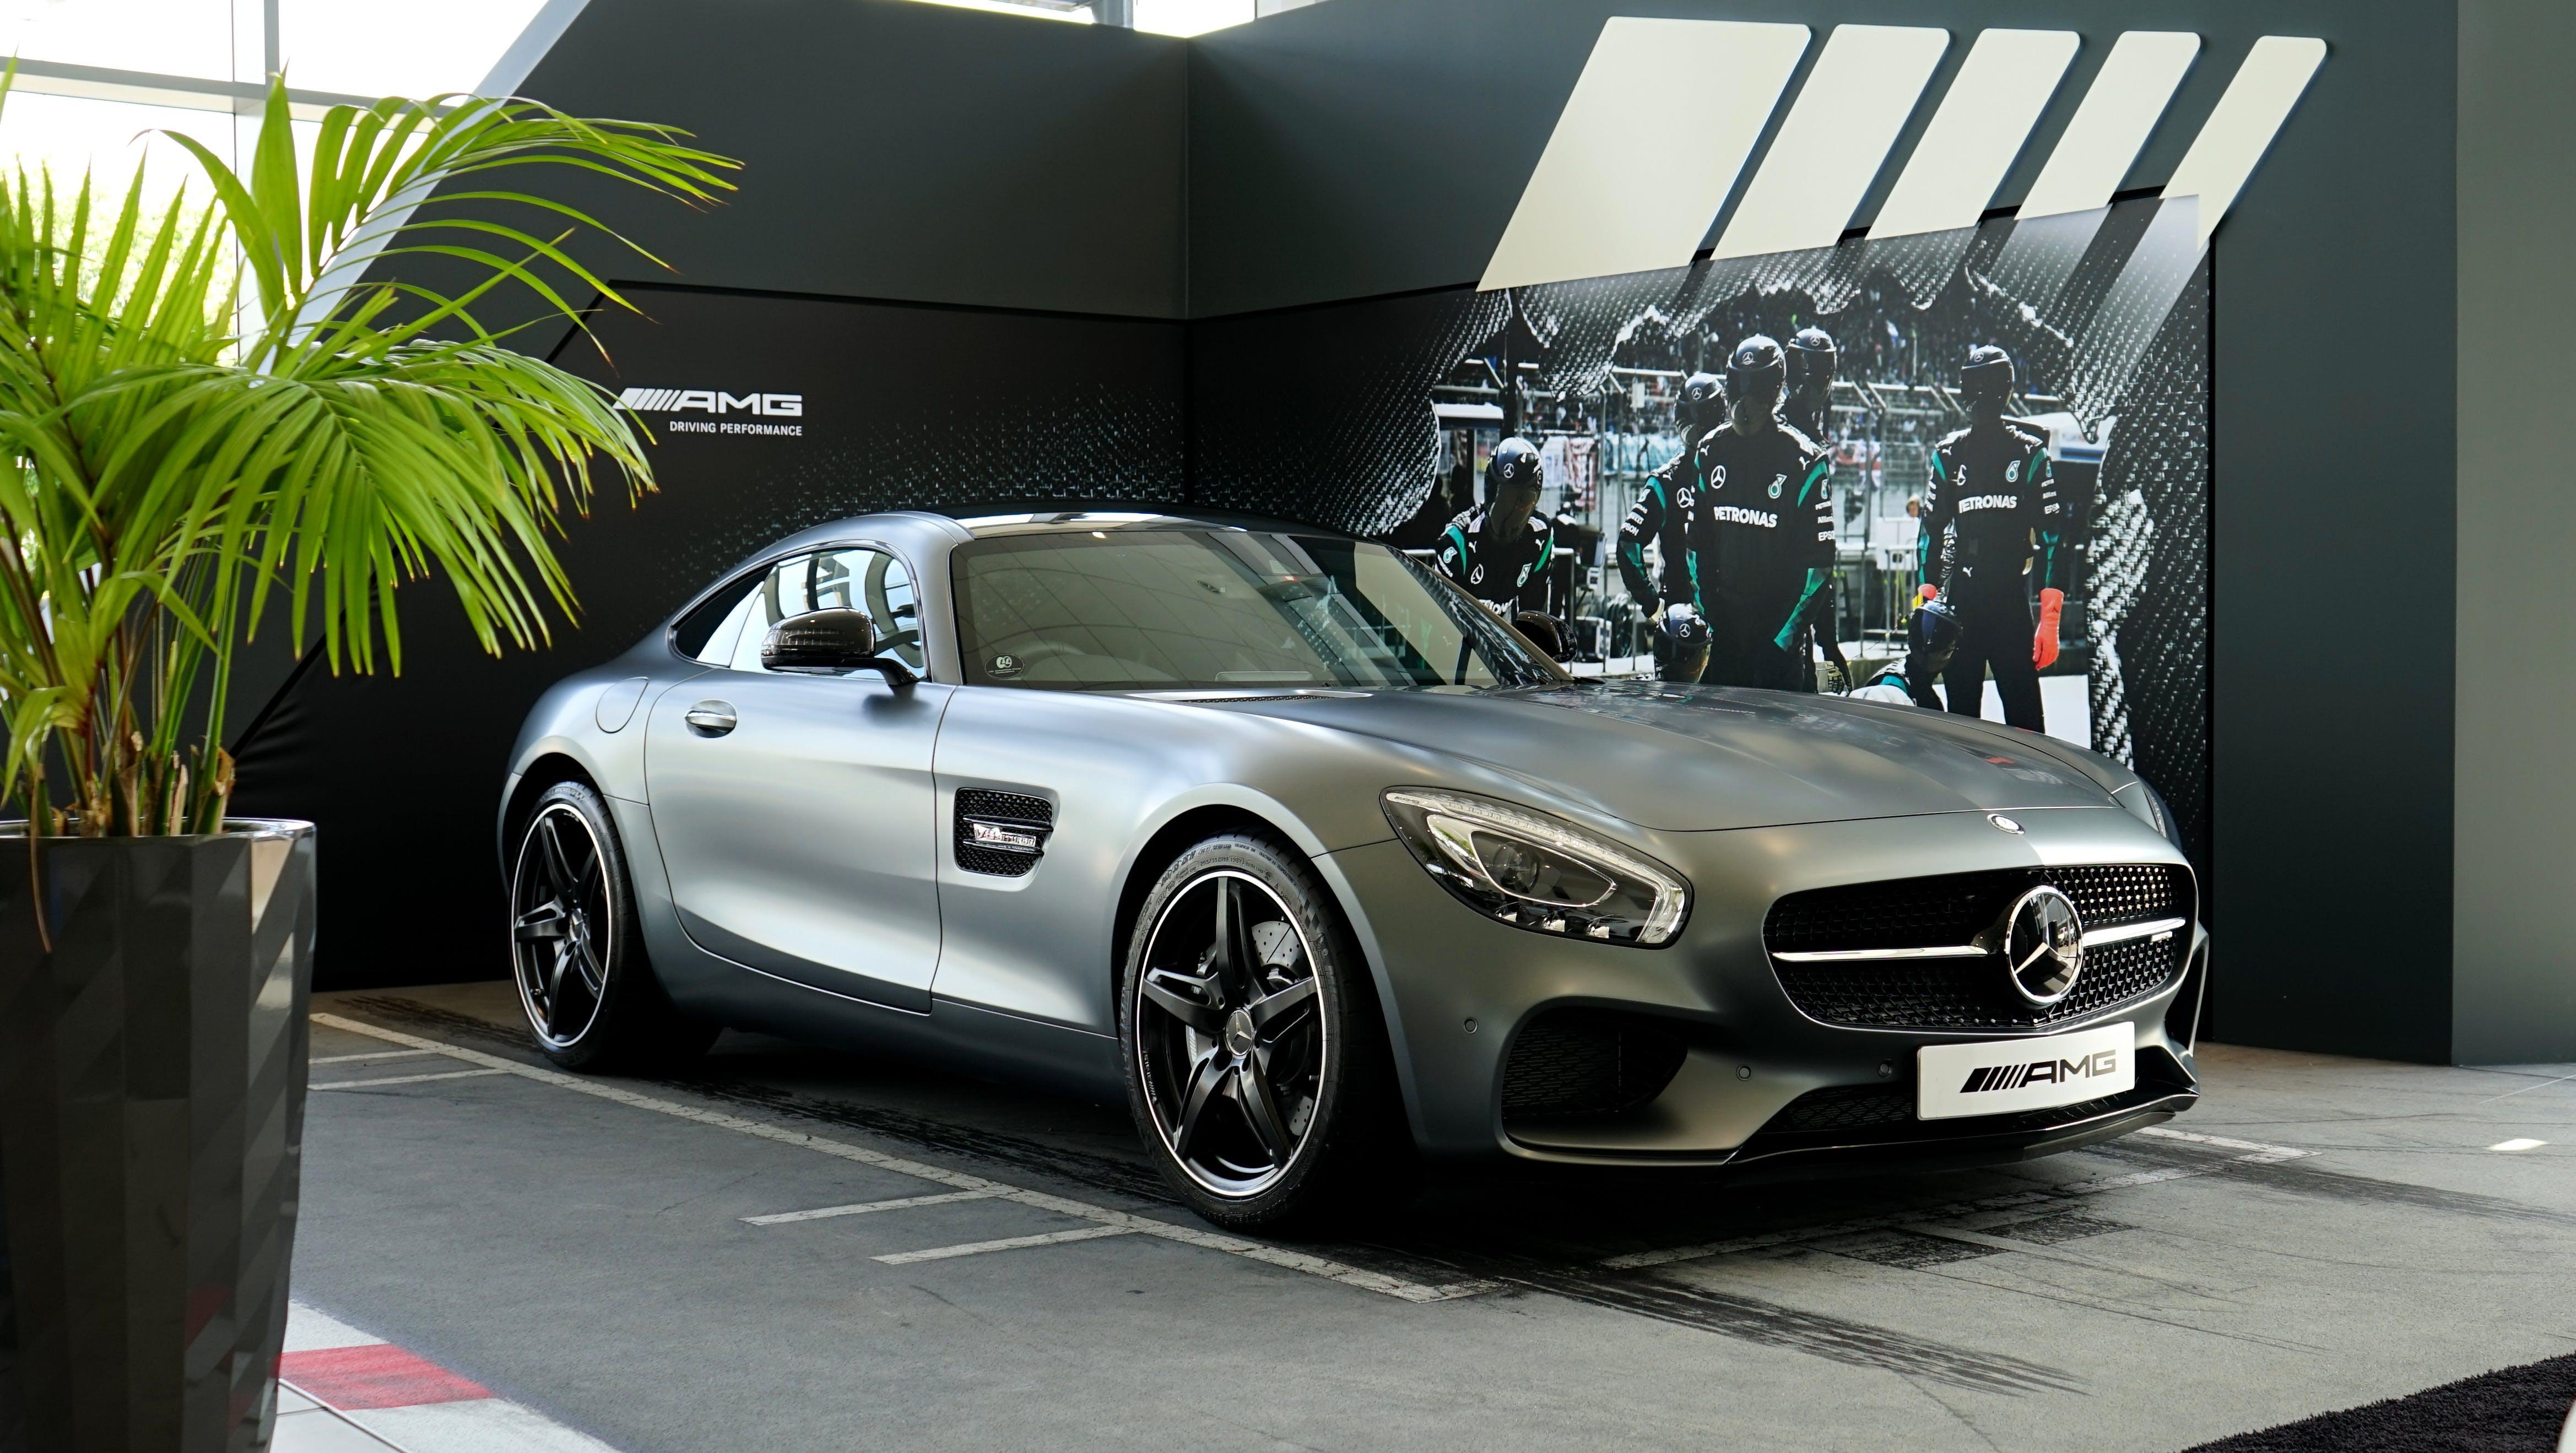 Free stock photo of metal, car, vehicle, luxury